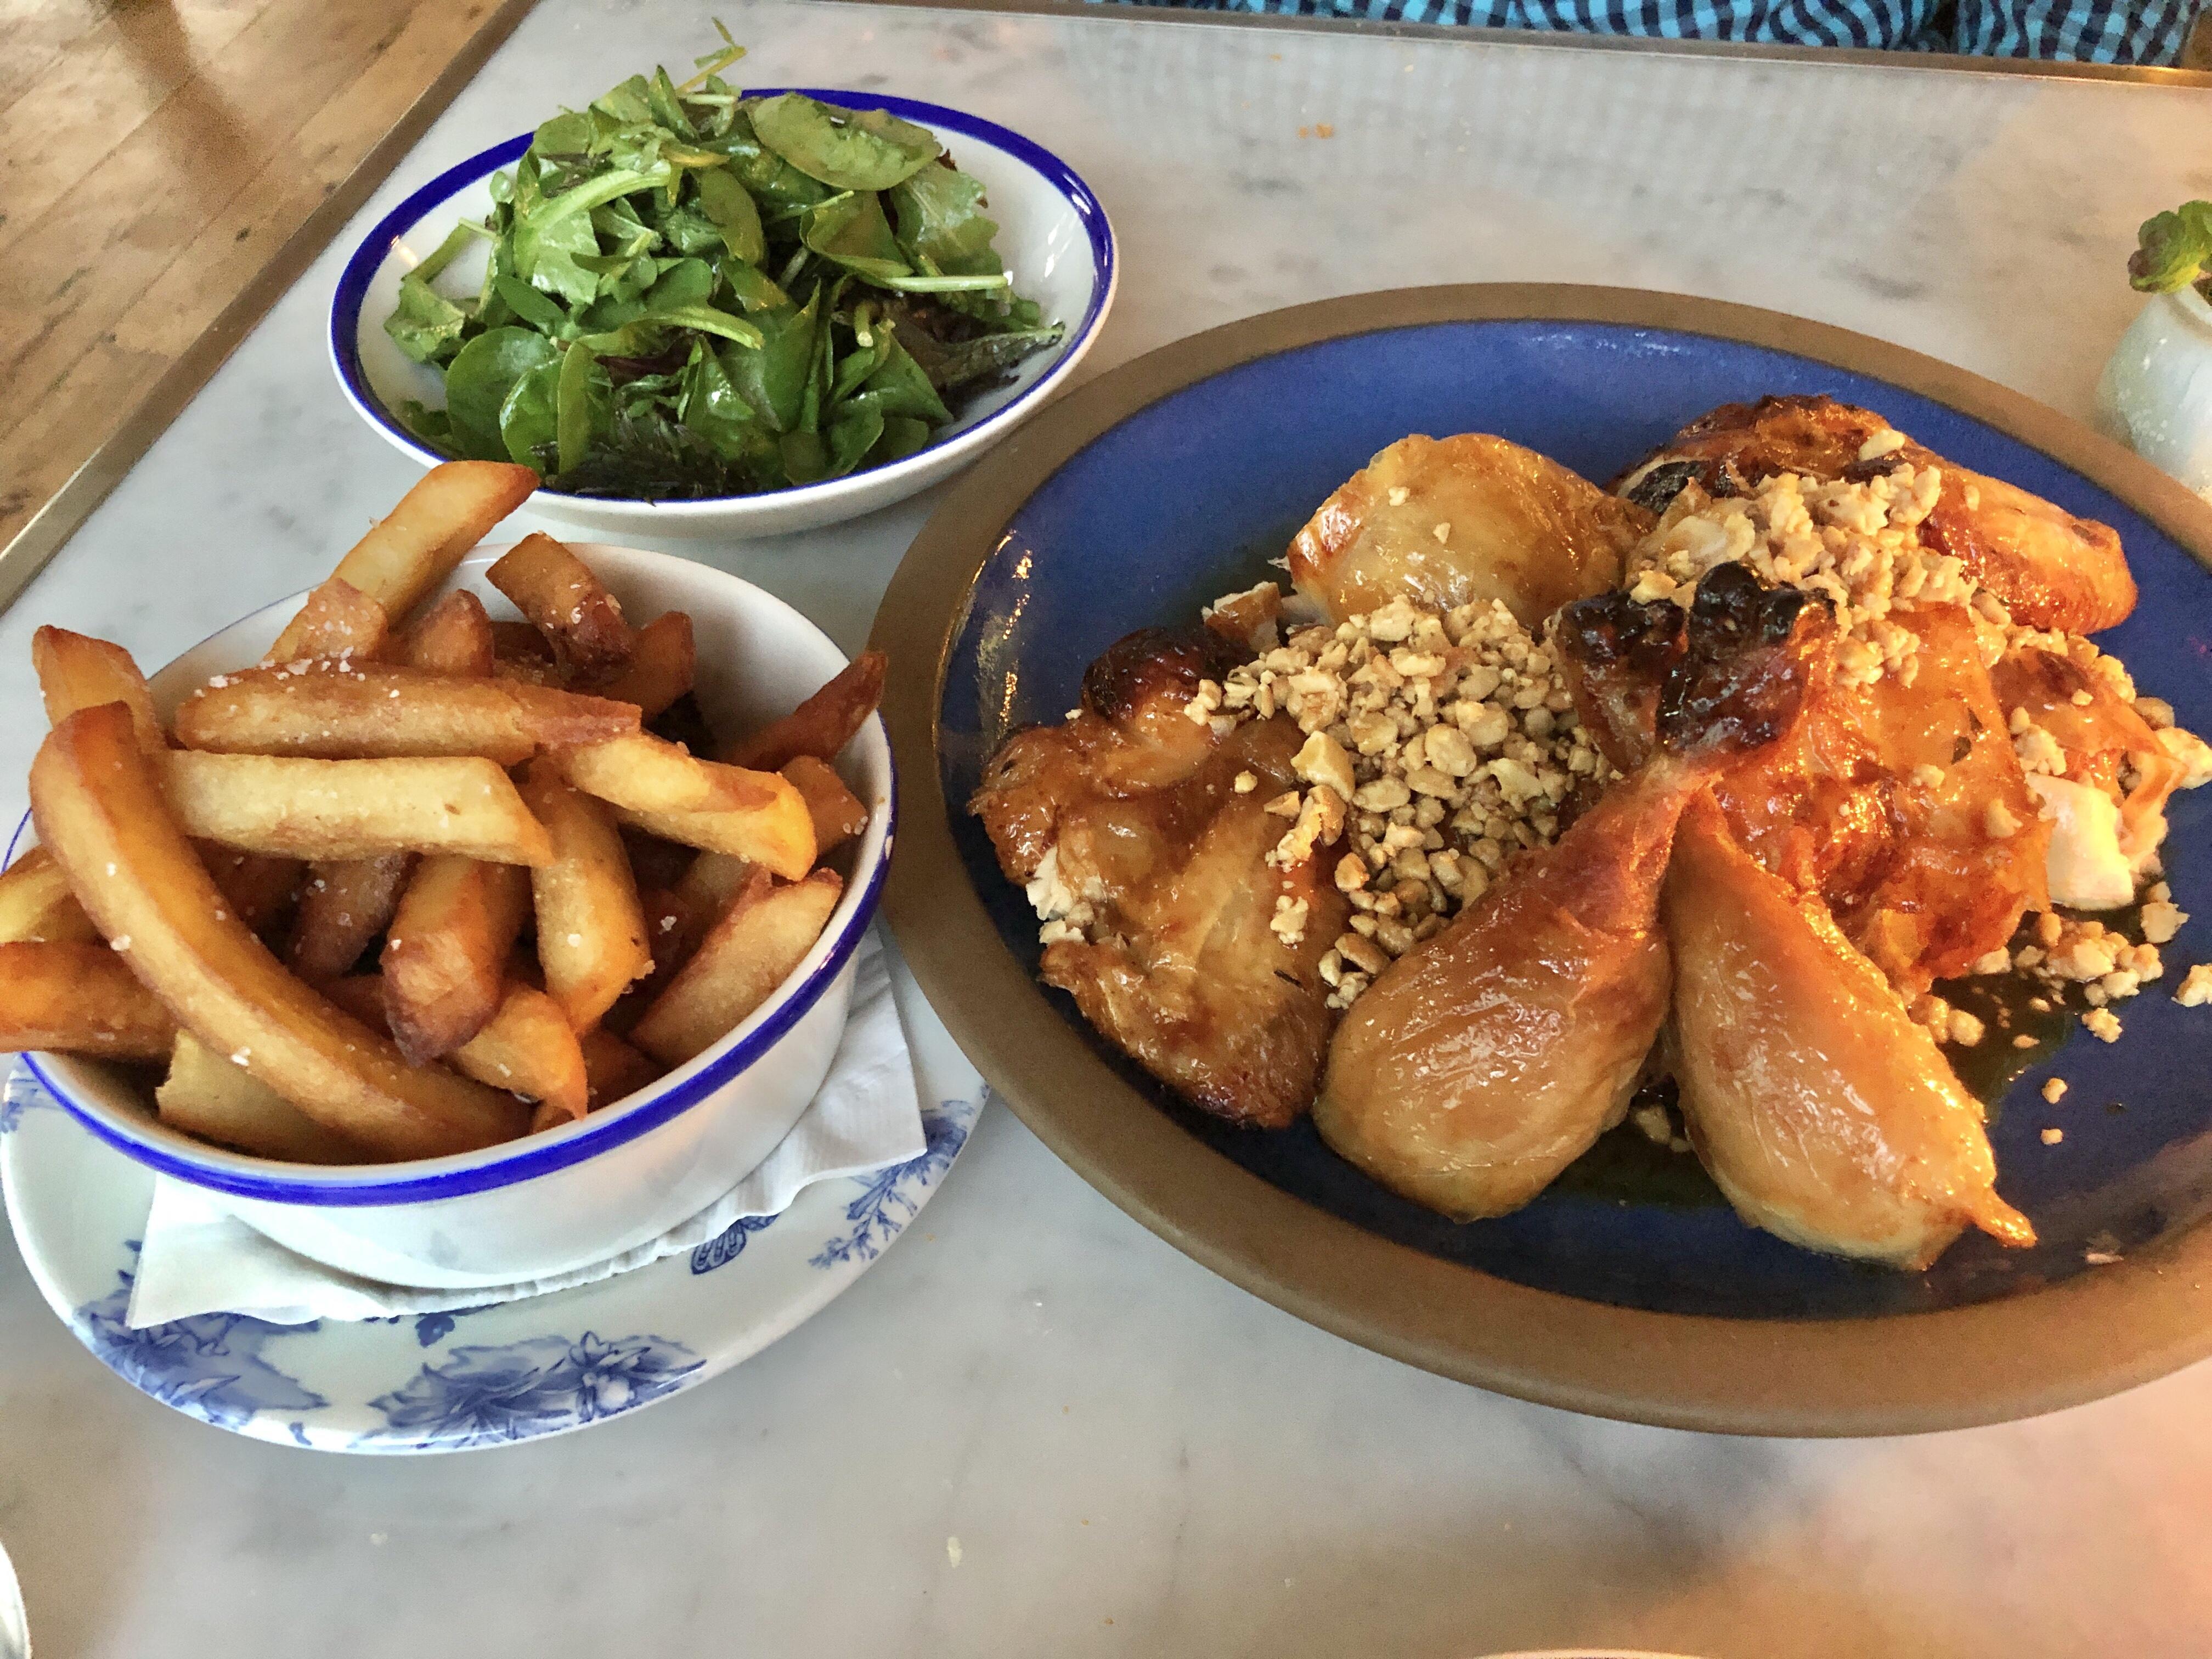 Roast chicken at Primrose in Brookland, DC